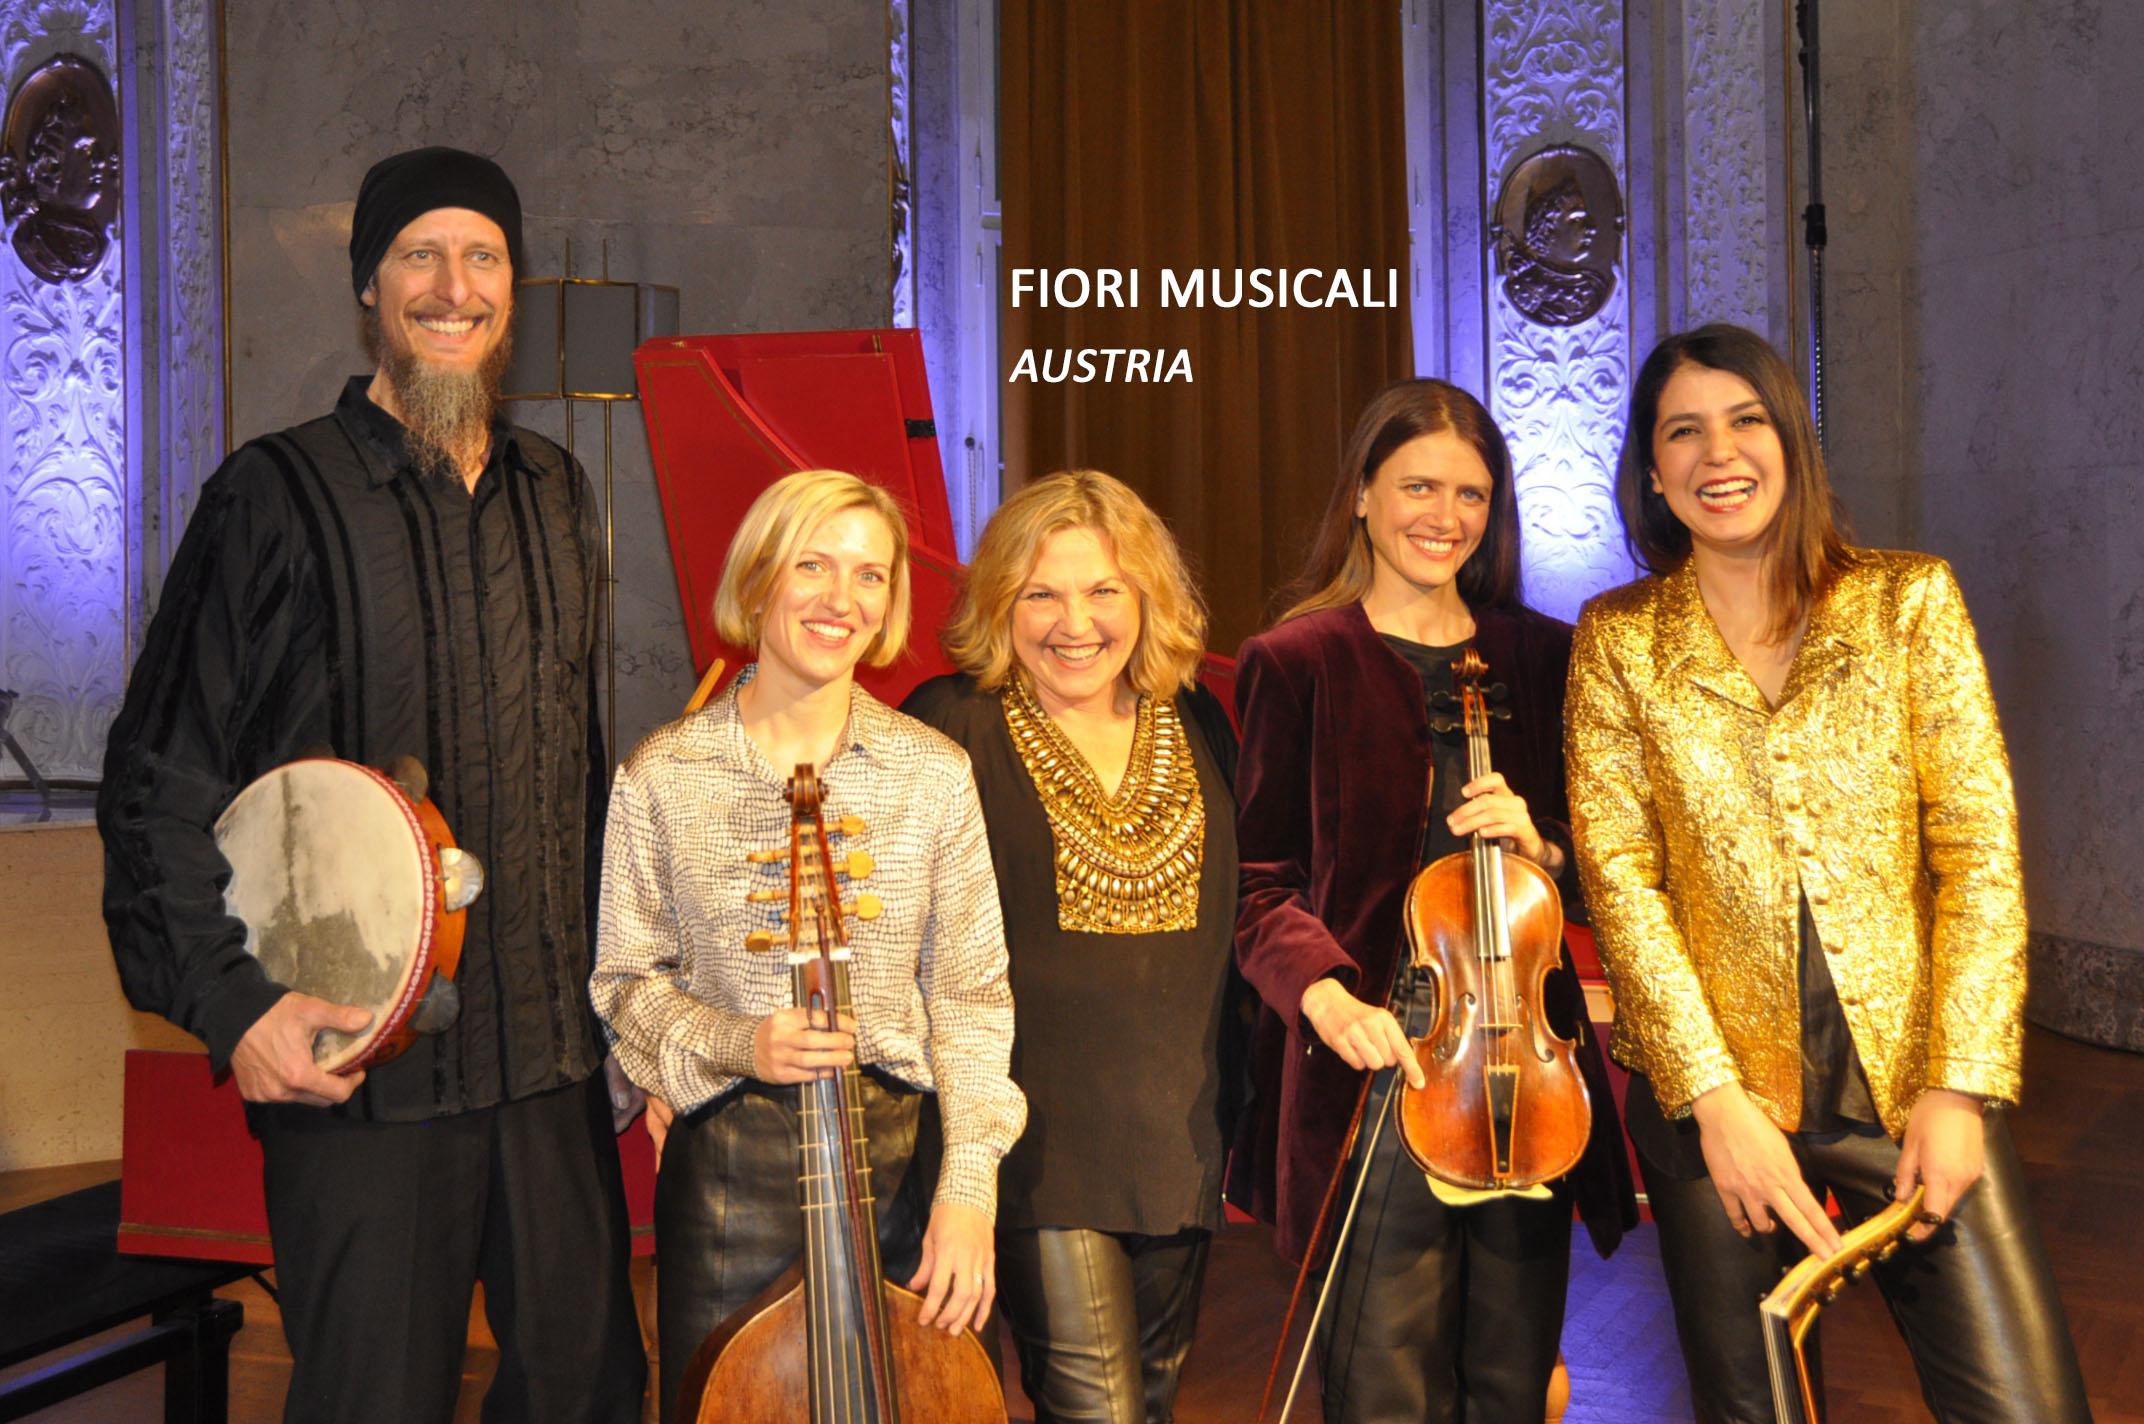 Fiori Musicali Austria